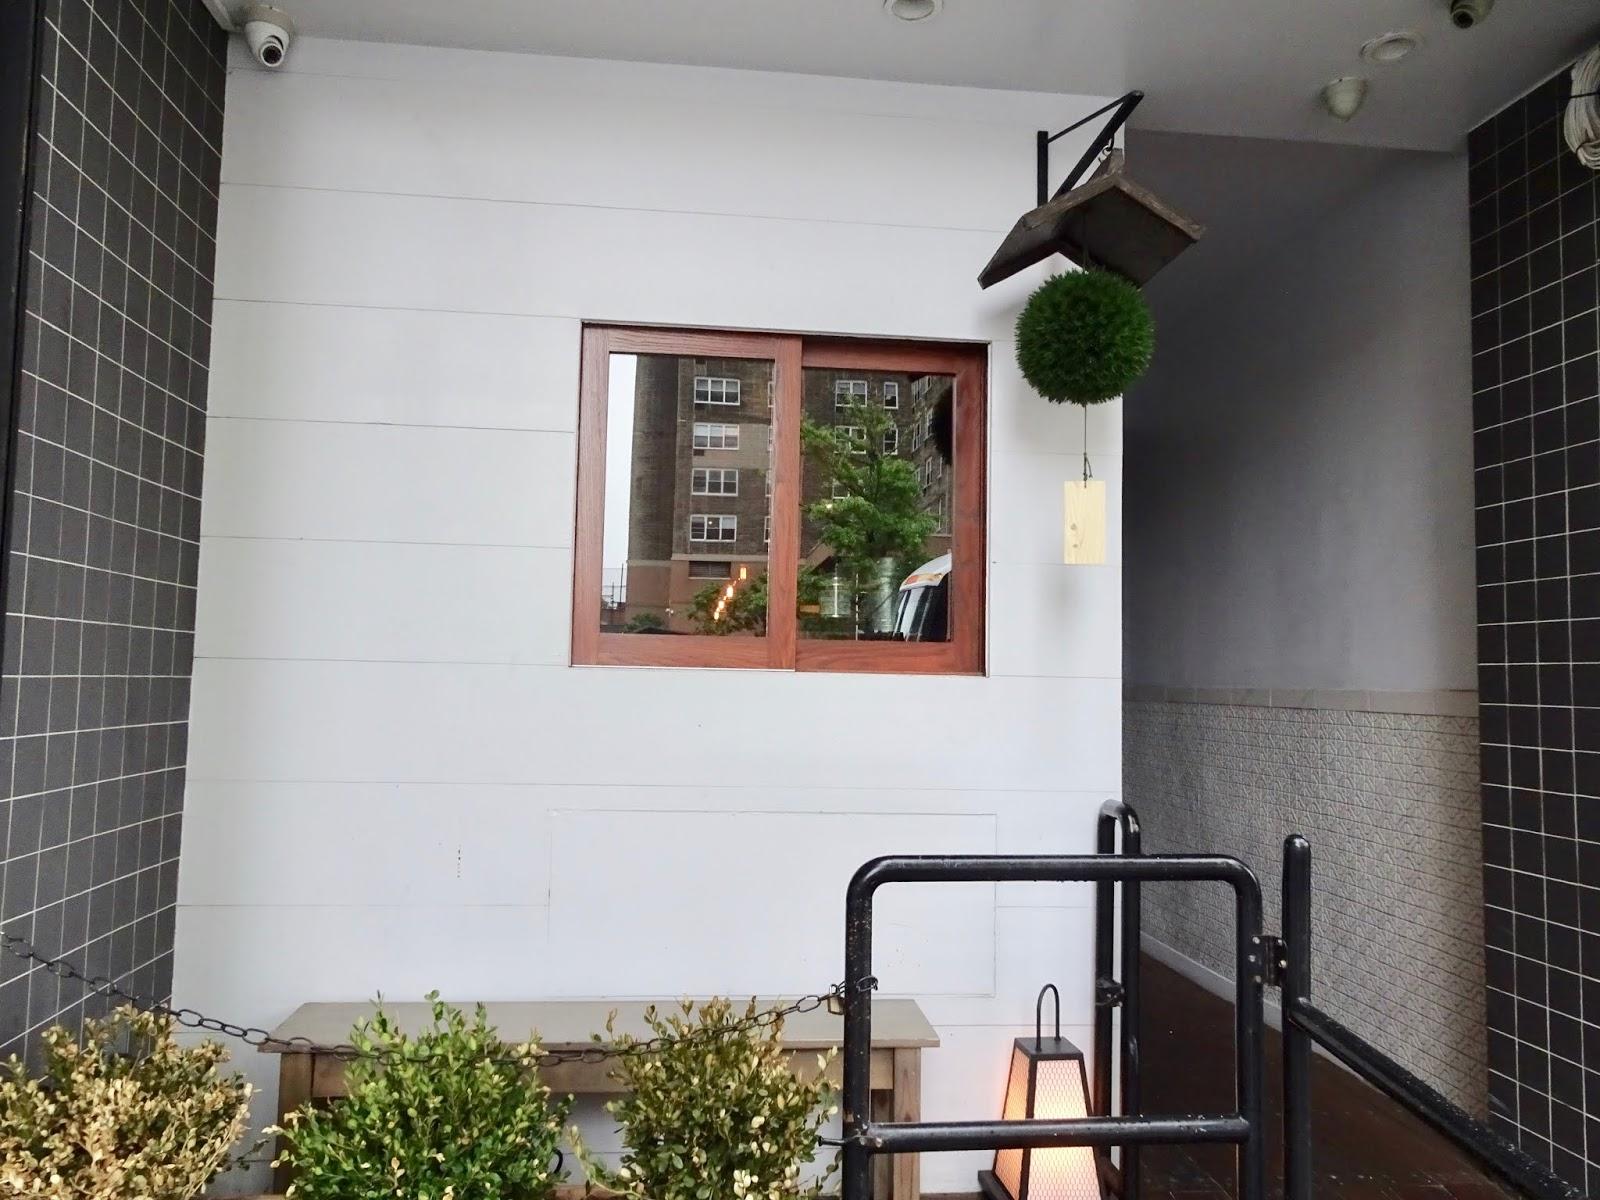 outside a restaurant